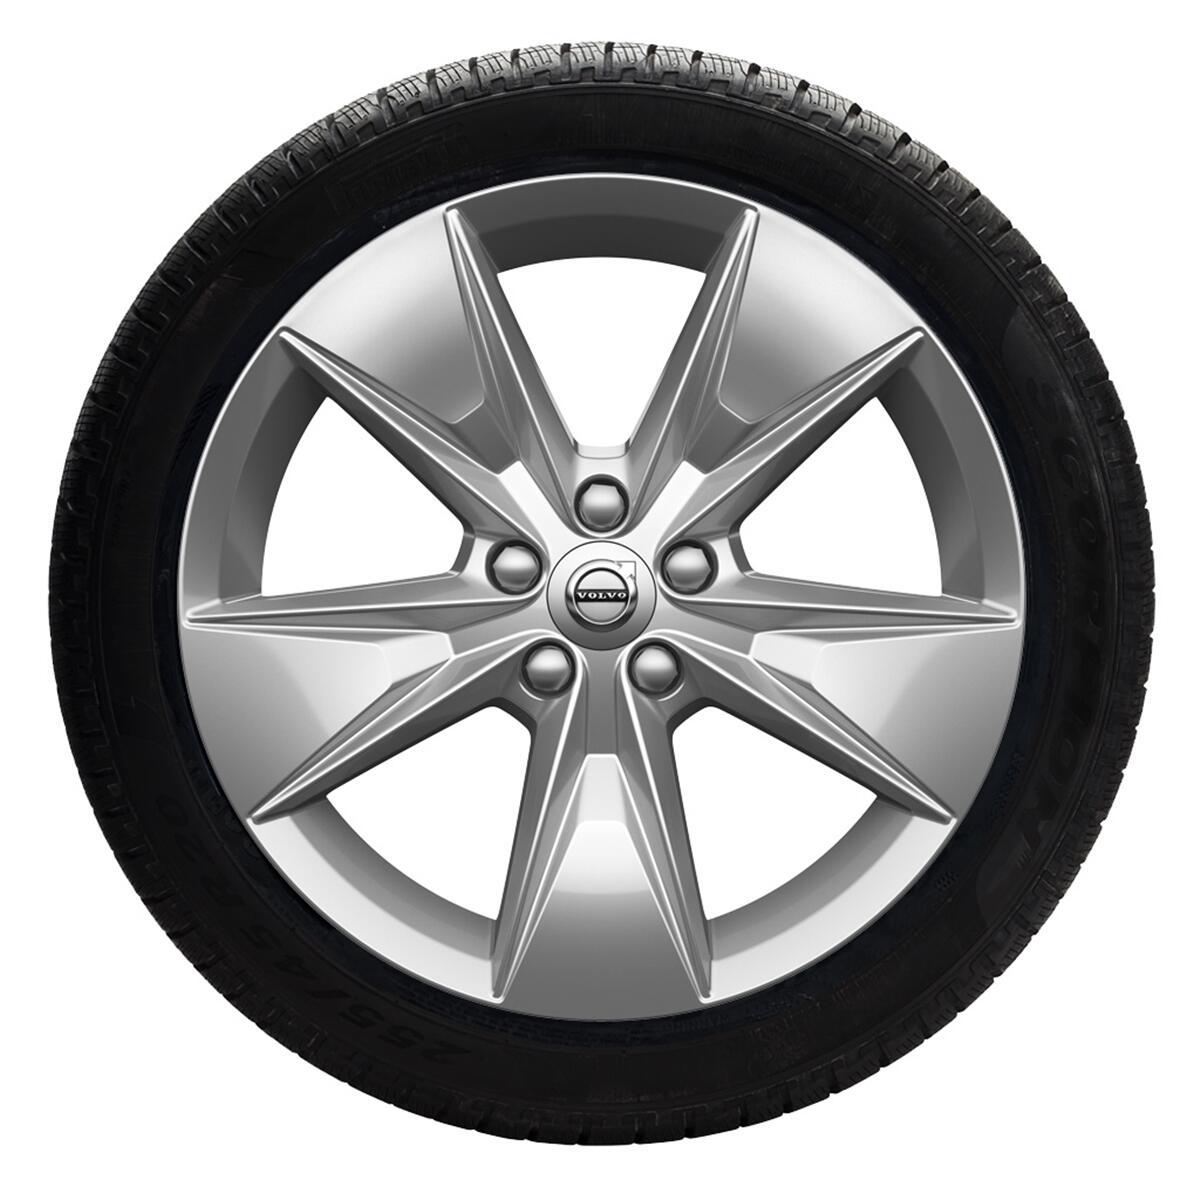 "Komplet zimskih koles:  45,70 cm (18""), pnevmatike Nokian"